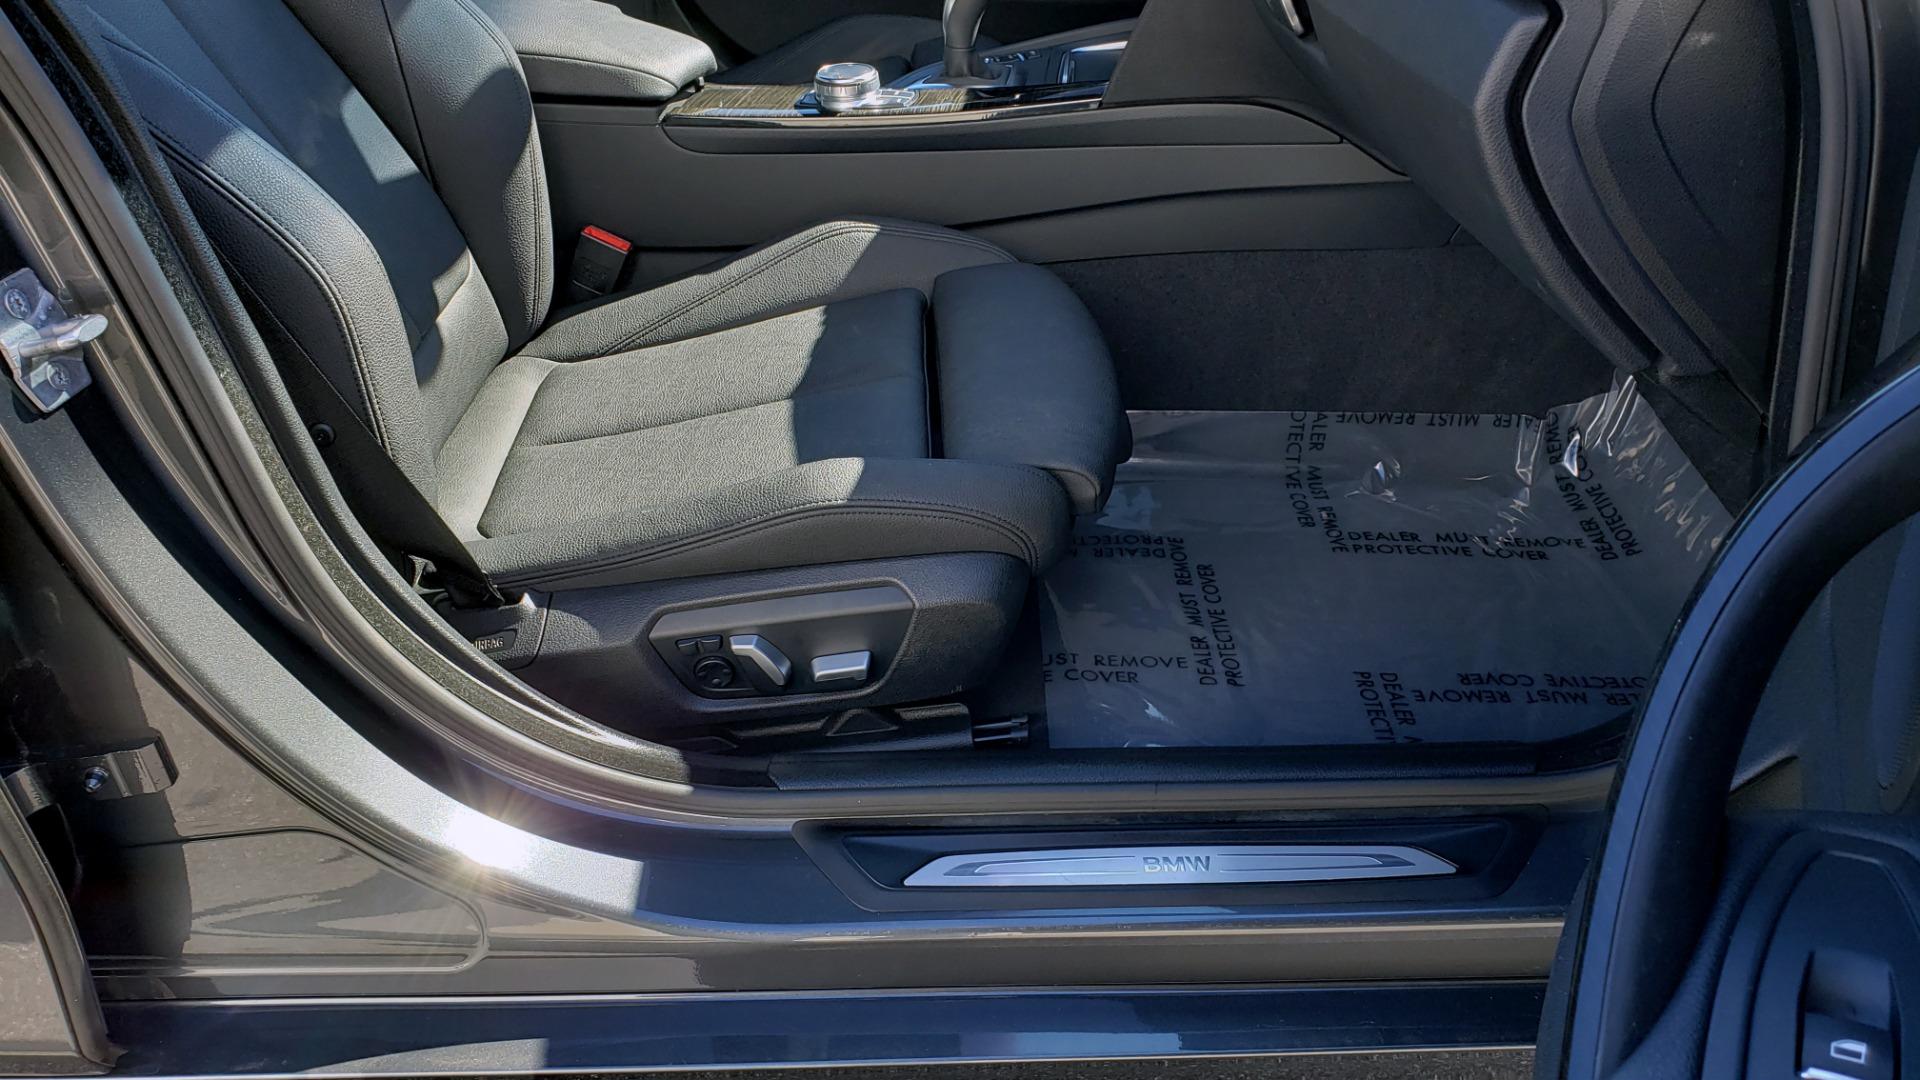 Used 2018 BMW 4 SERIES 430IXDRIVE / PREMIUM / NAV / SUNROOF / ESSENTIALS PKG for sale $29,495 at Formula Imports in Charlotte NC 28227 65